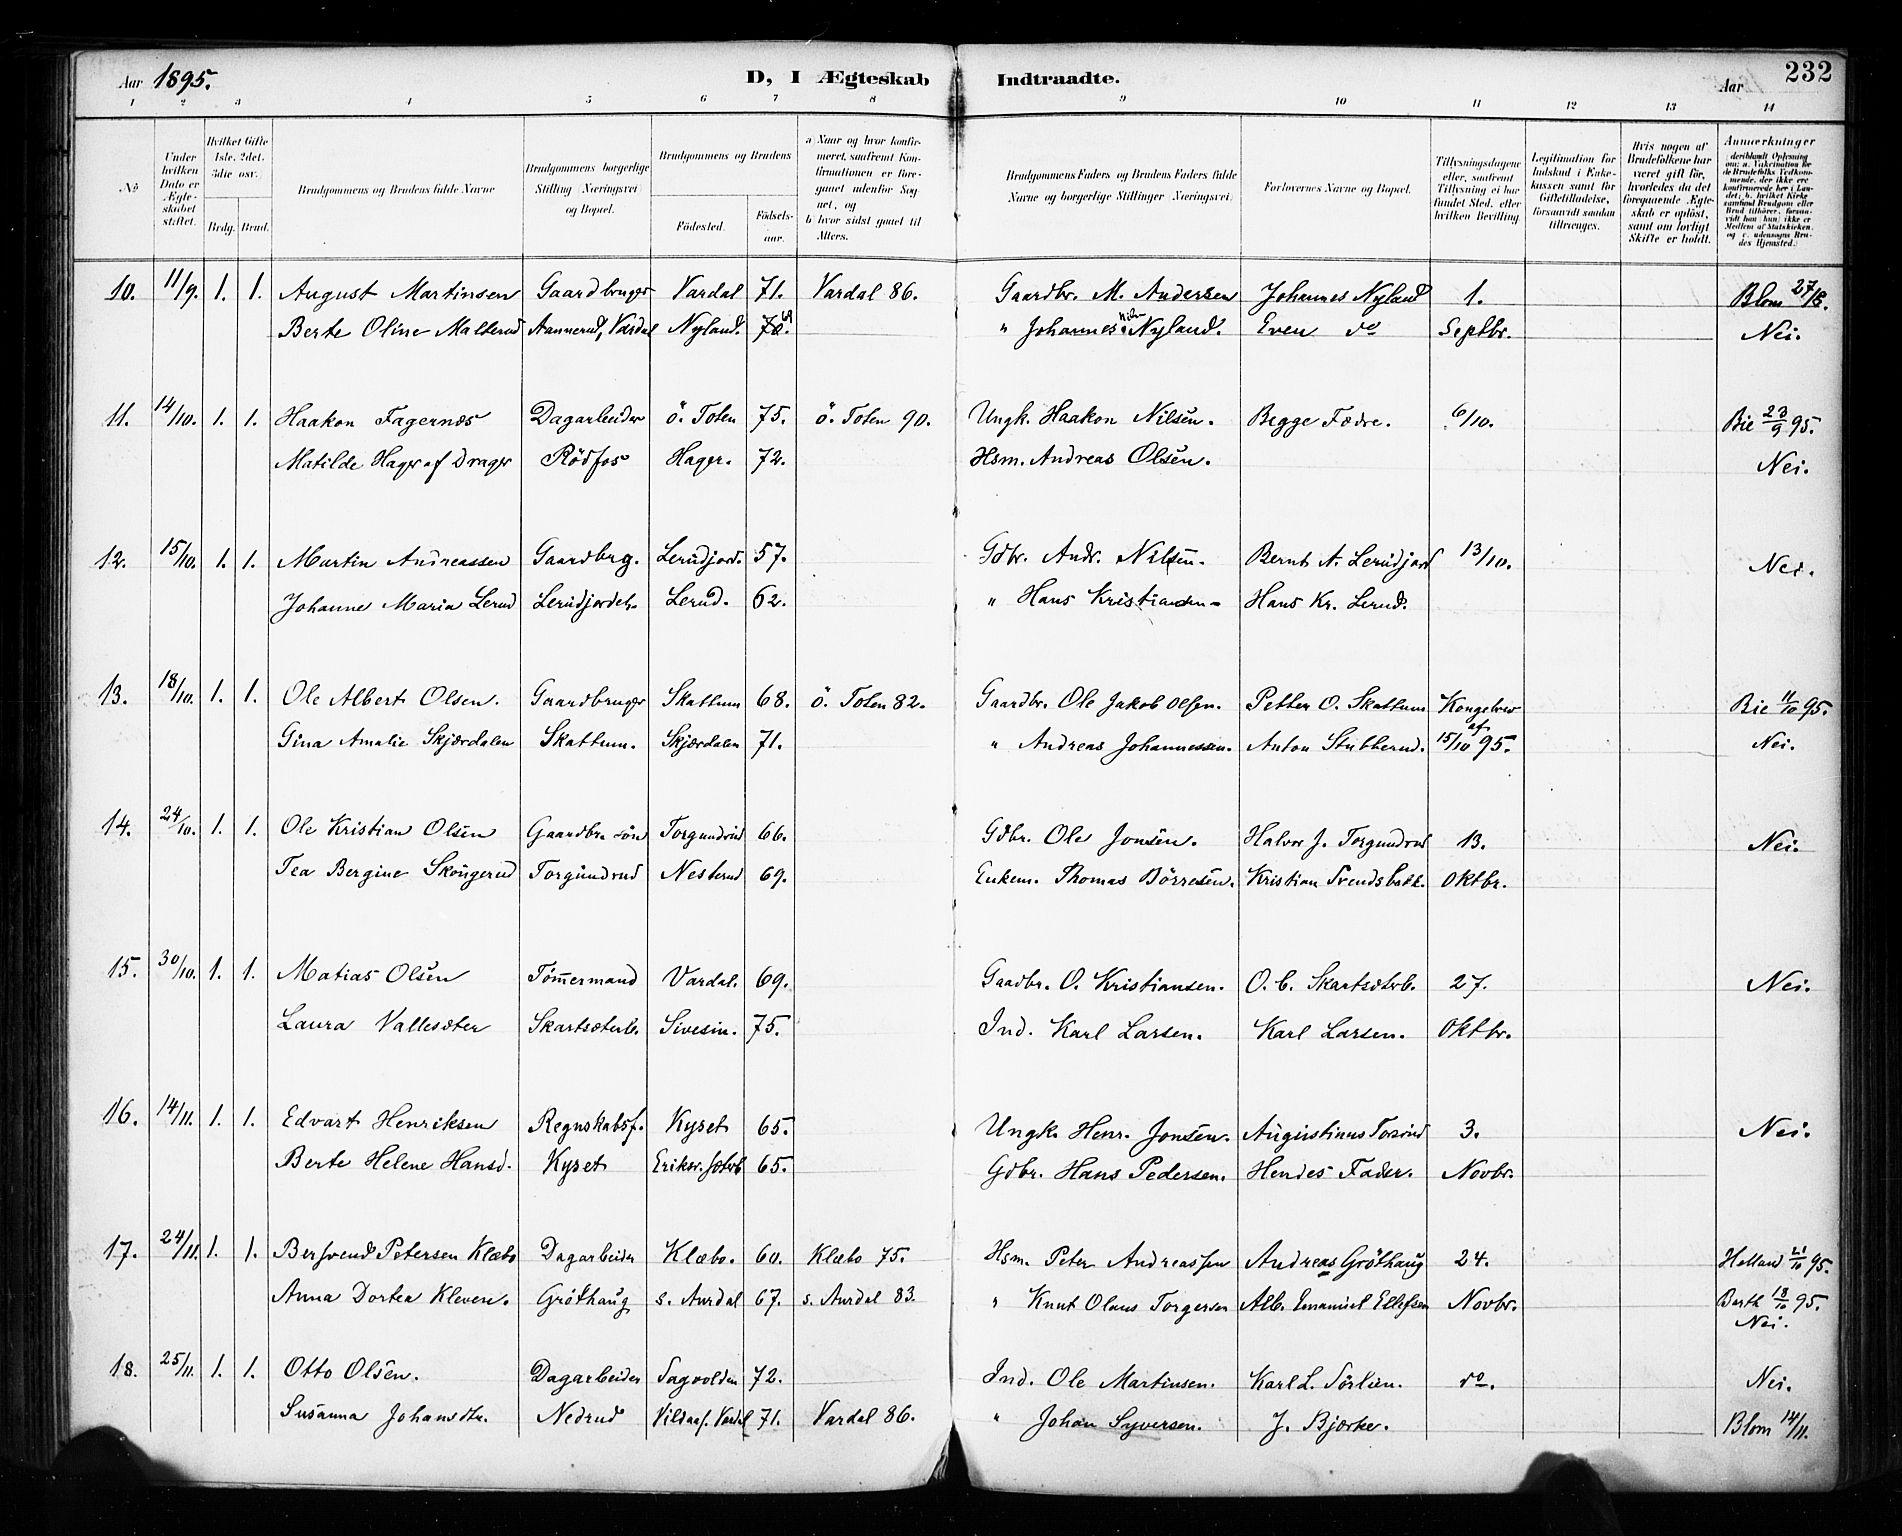 SAH, Vestre Toten prestekontor, H/Ha/Haa/L0011: Ministerialbok nr. 11, 1895-1906, s. 232